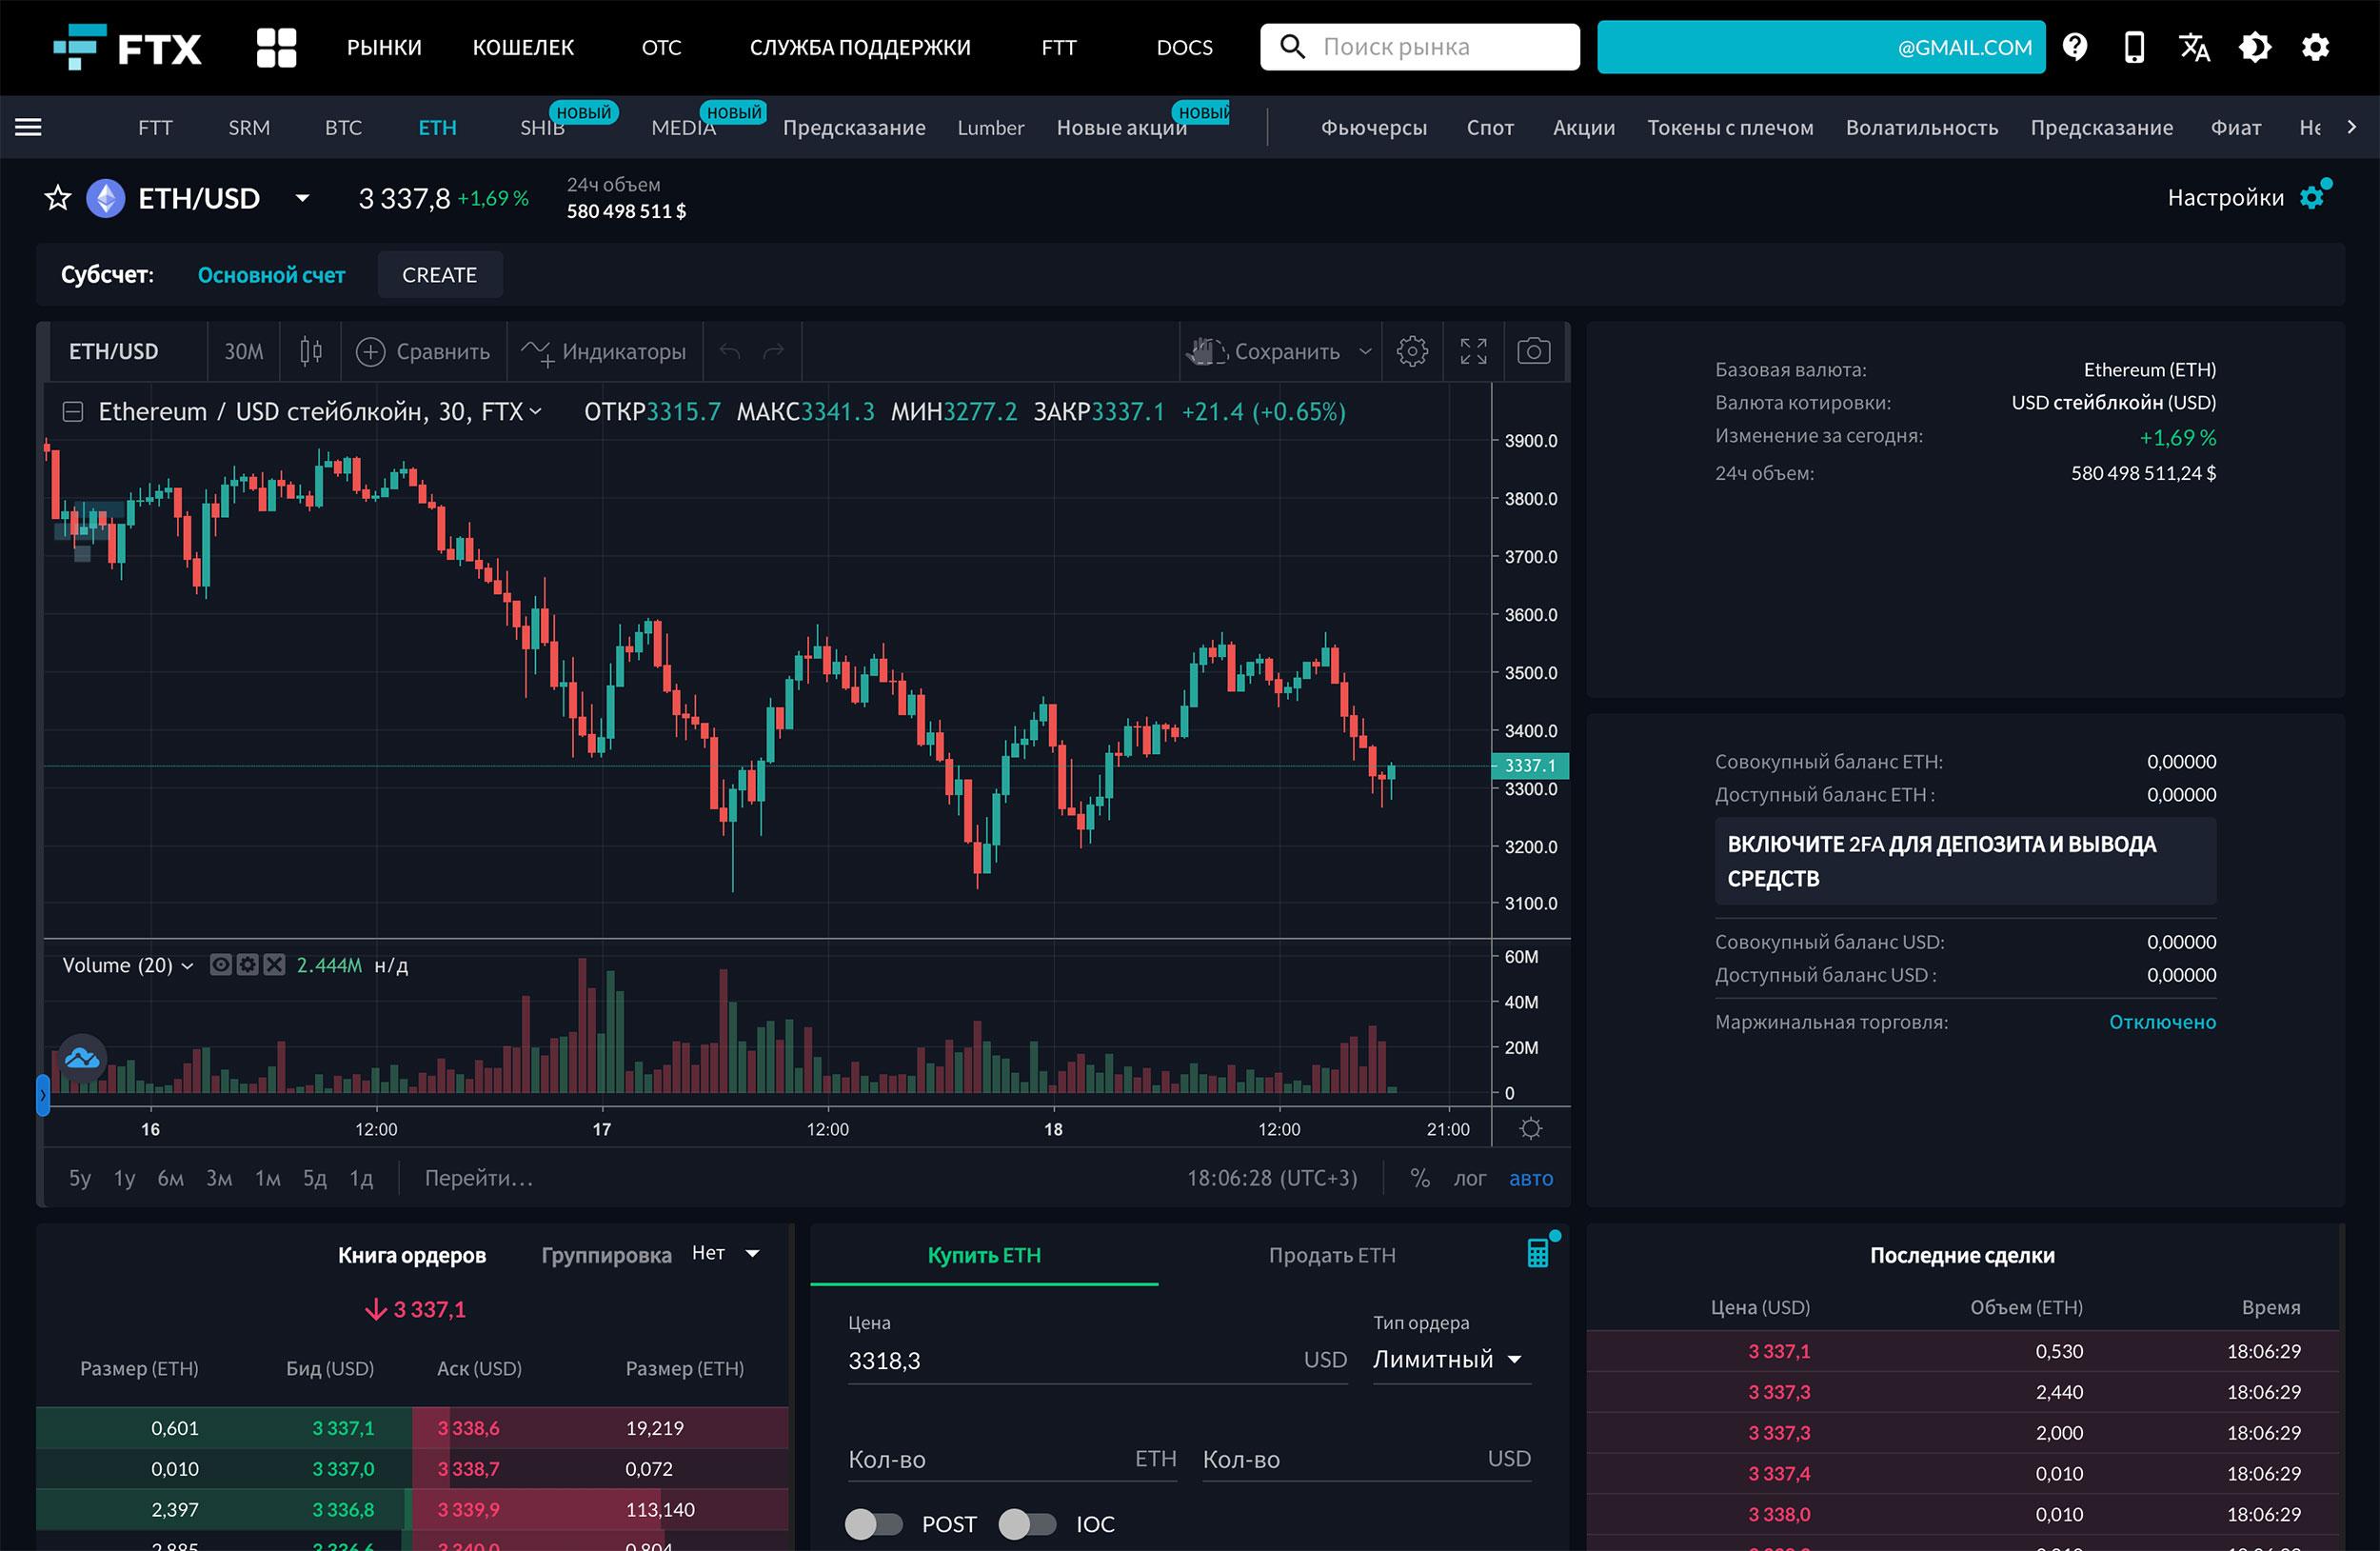 биржа криптовалют ftx платформа интерфейс